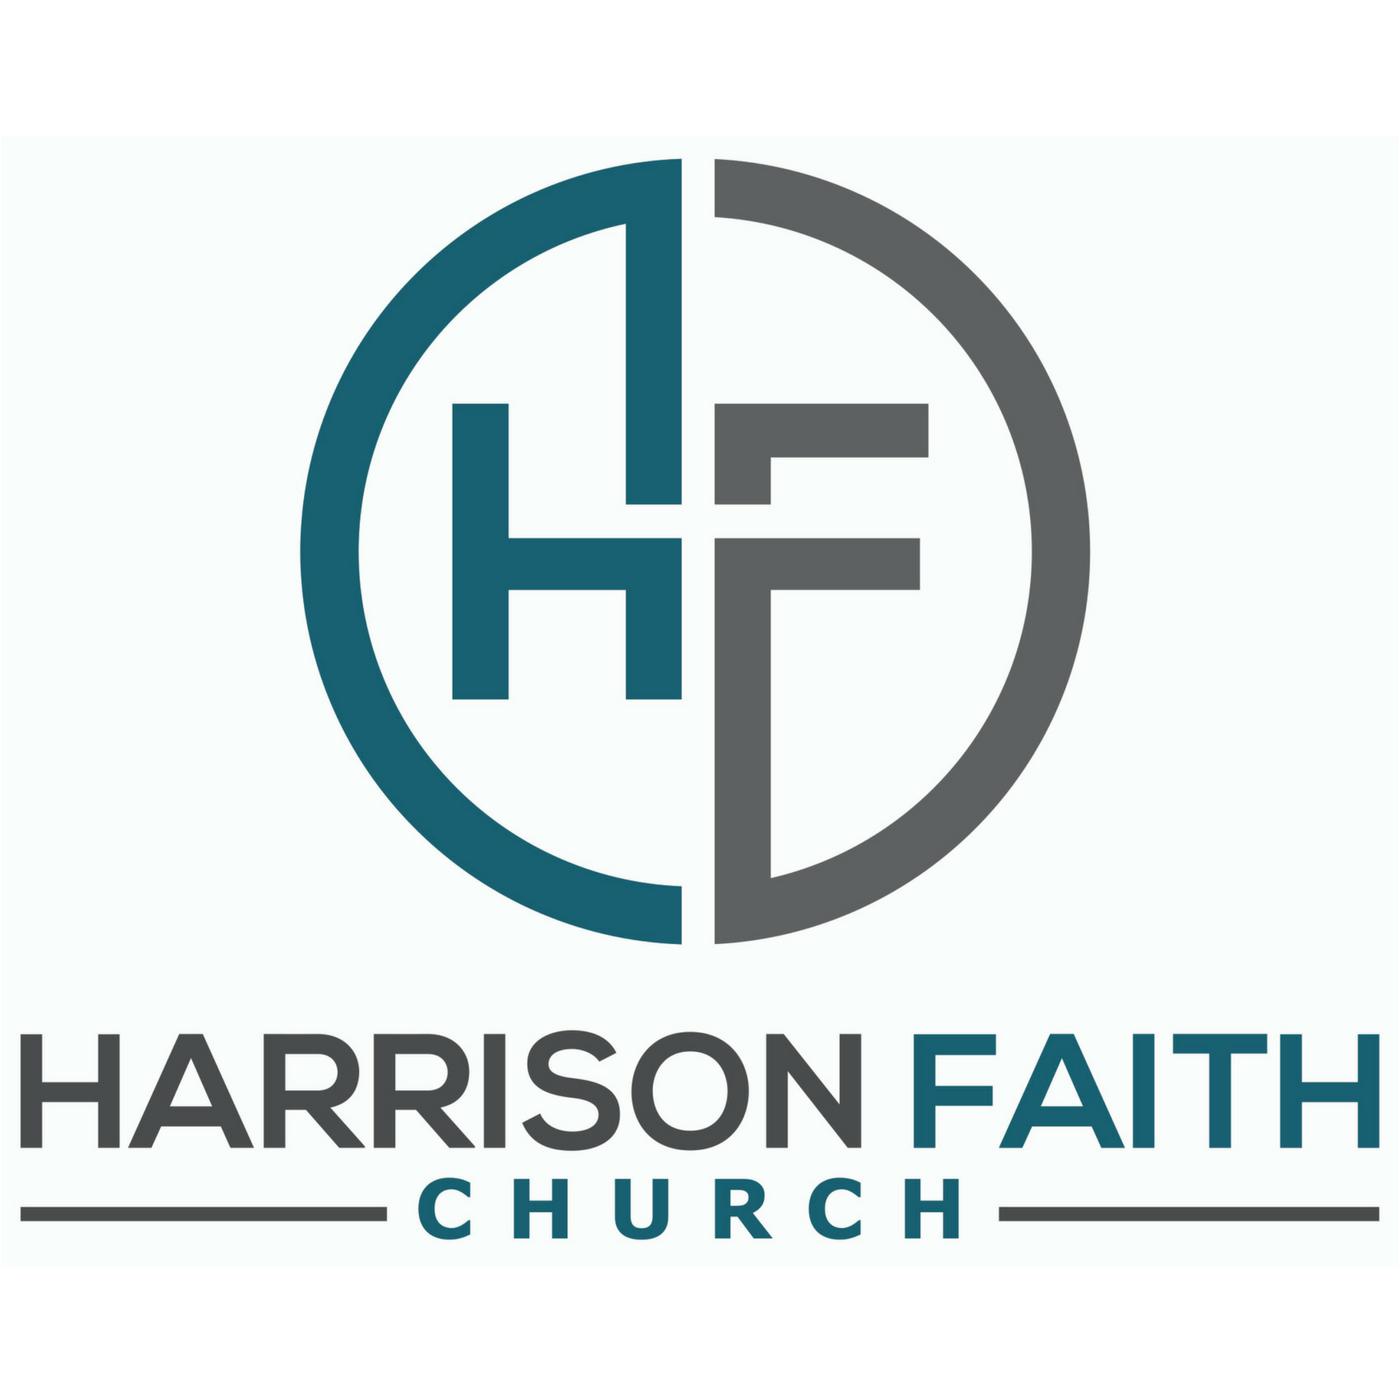 Harrison Faith Church